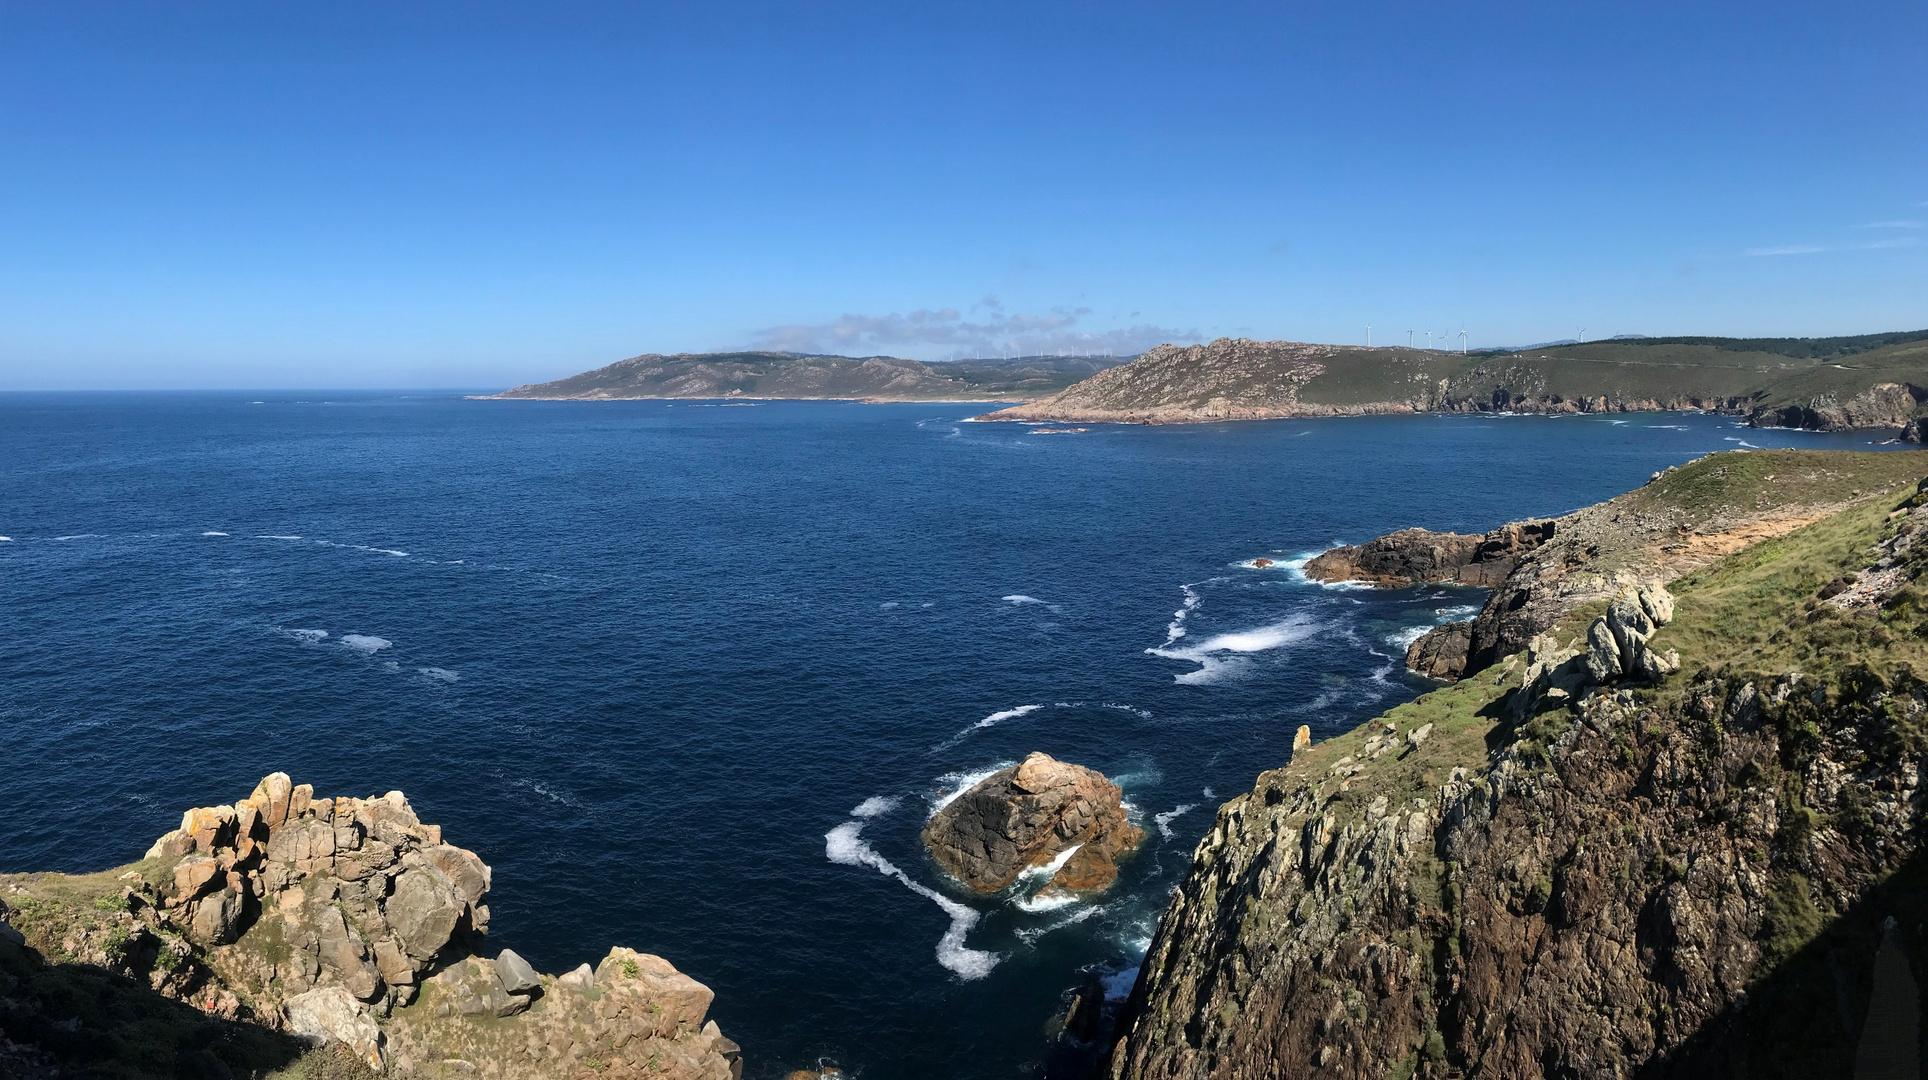 Cap Vilan sur la côte de la Mort